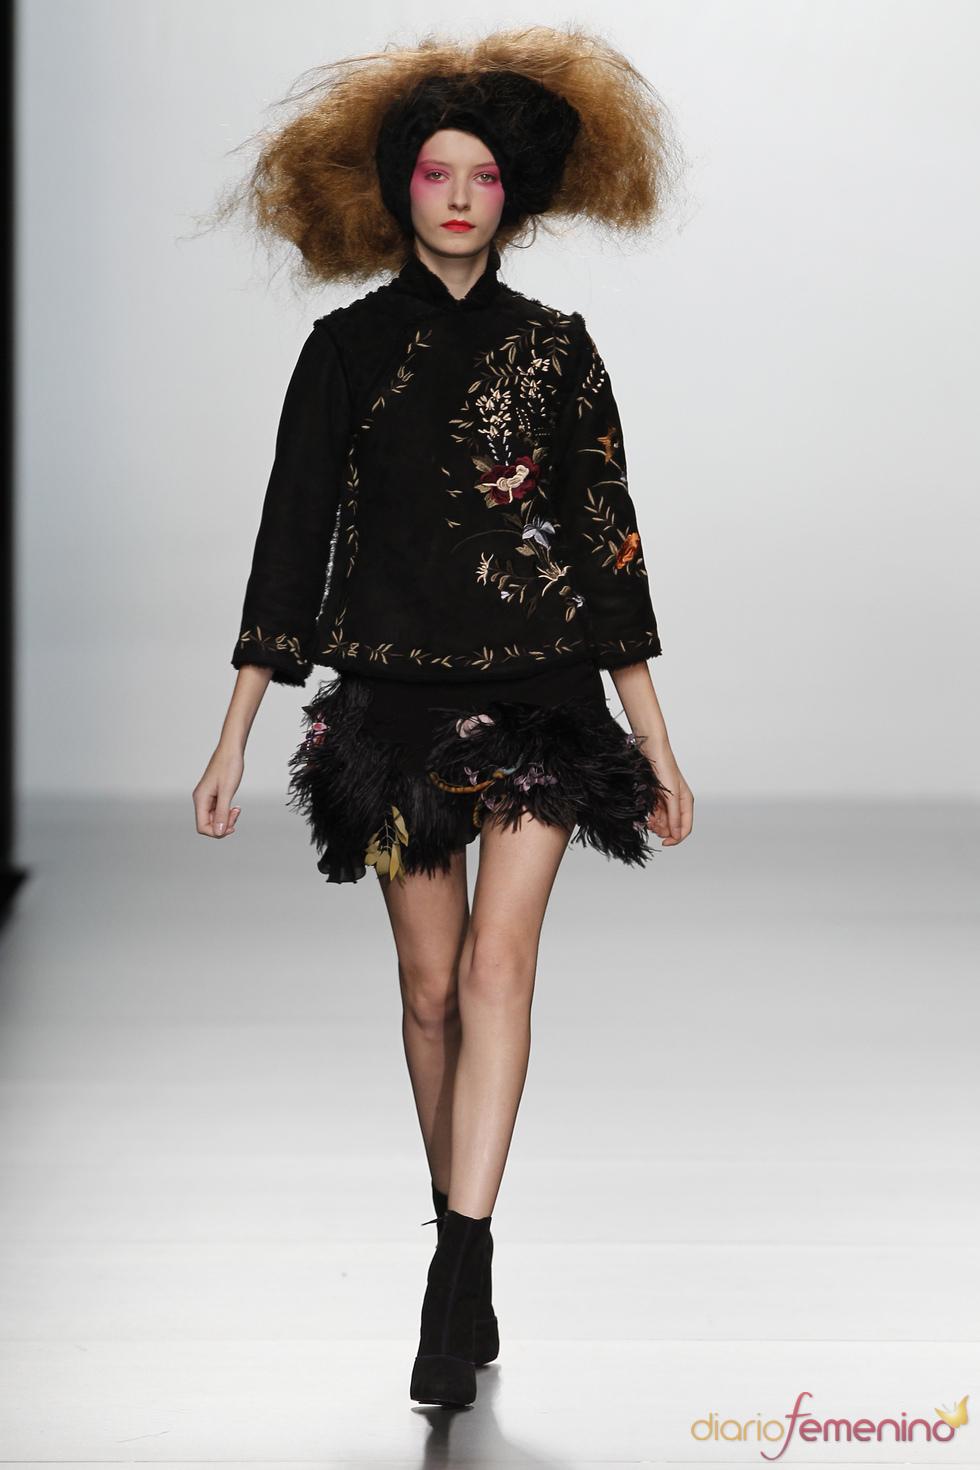 Chaqueta y falda de Elisa Palomino O/I 2011-12. Cibeles Madrid Fashion Week